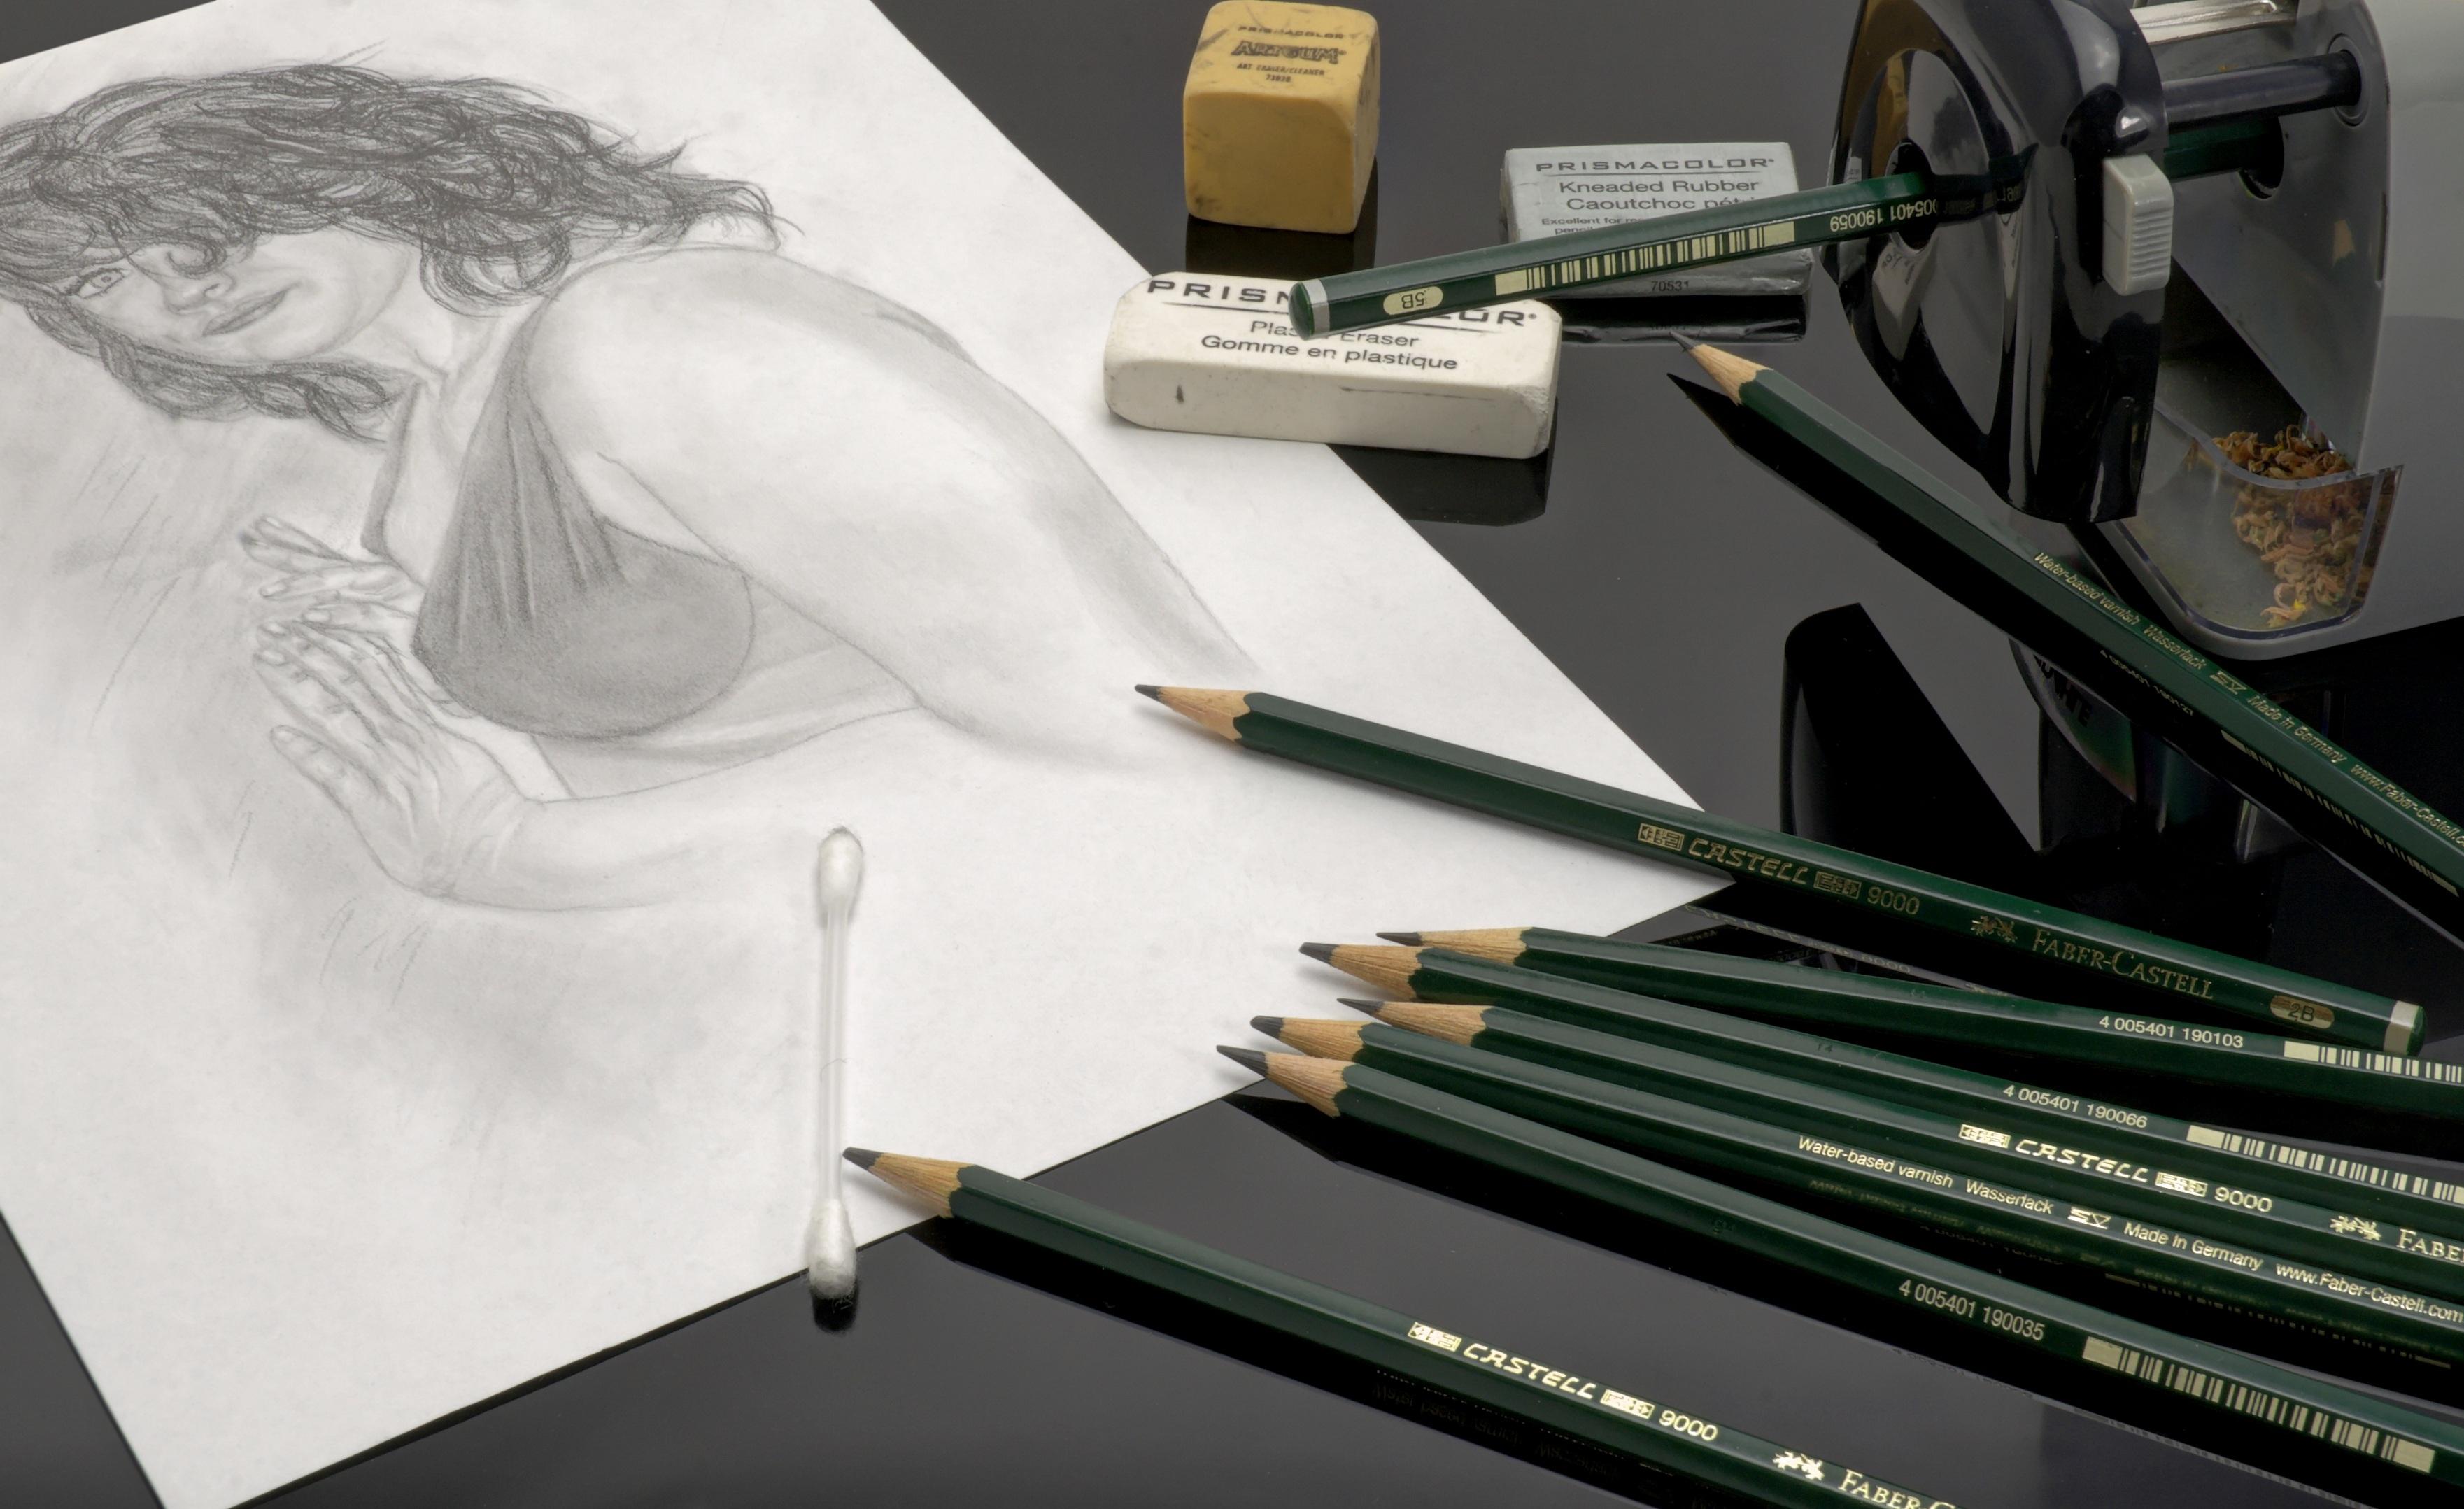 Desk writing pencil leaf office paper artwork eraser art sketch drawing pens stationery document draw artists